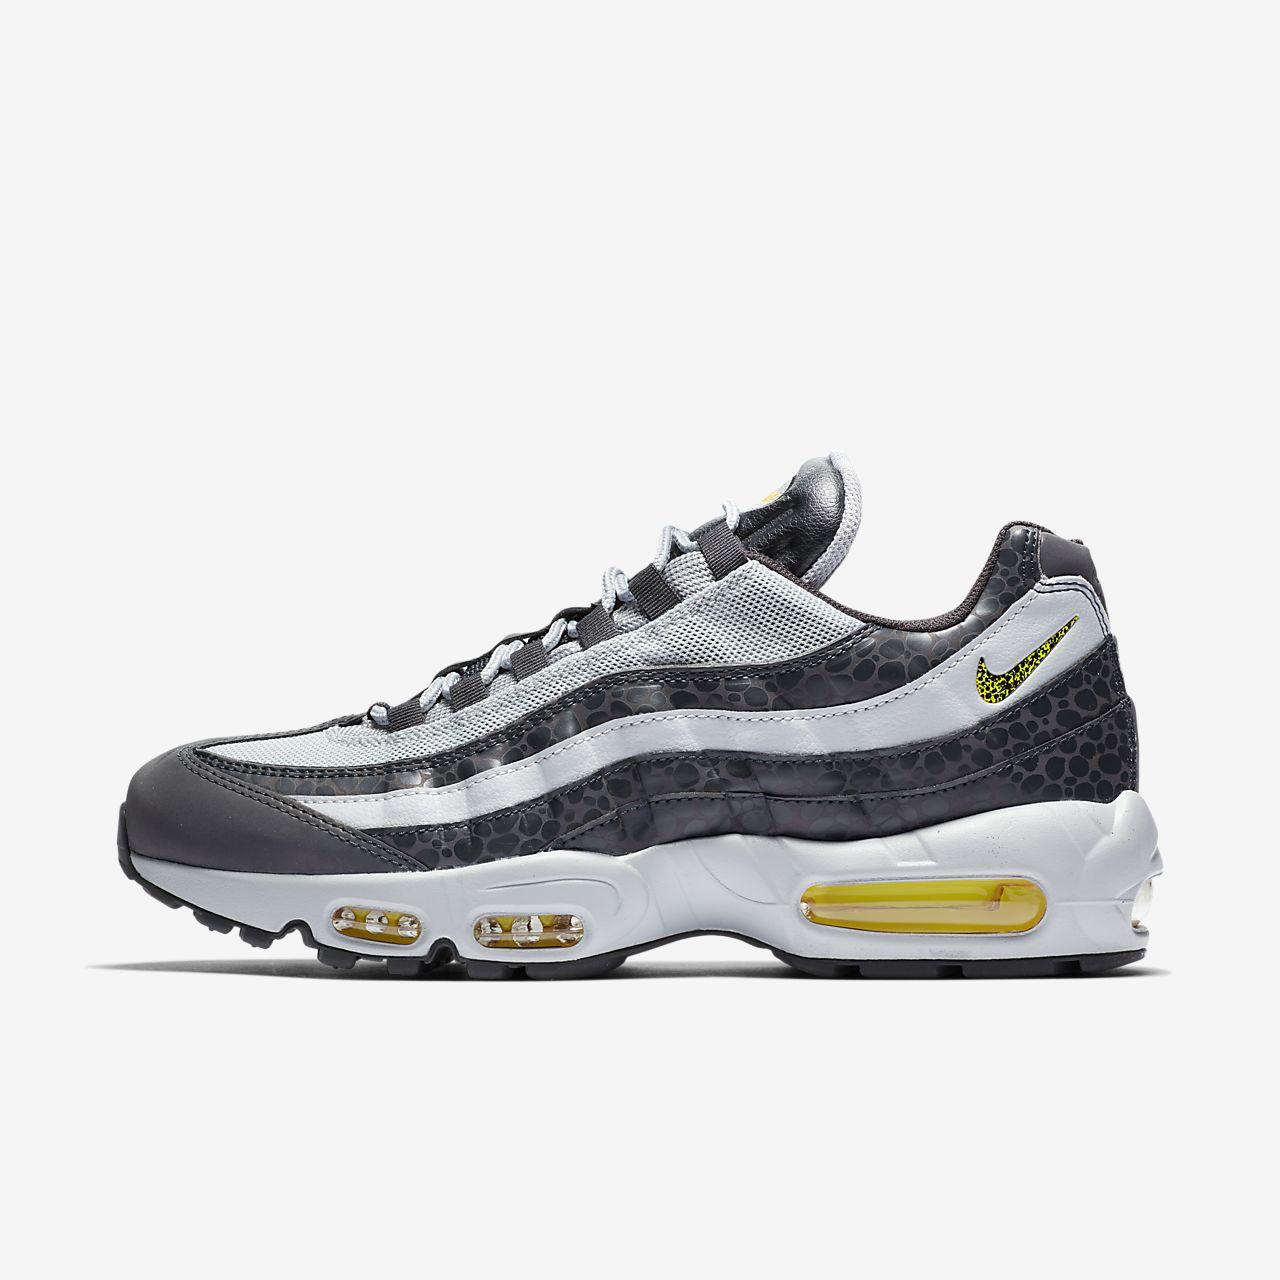 reputable site cb21e ceedd Be 95 Chaussure Nike Homme Air Pour Se Max qnzCT